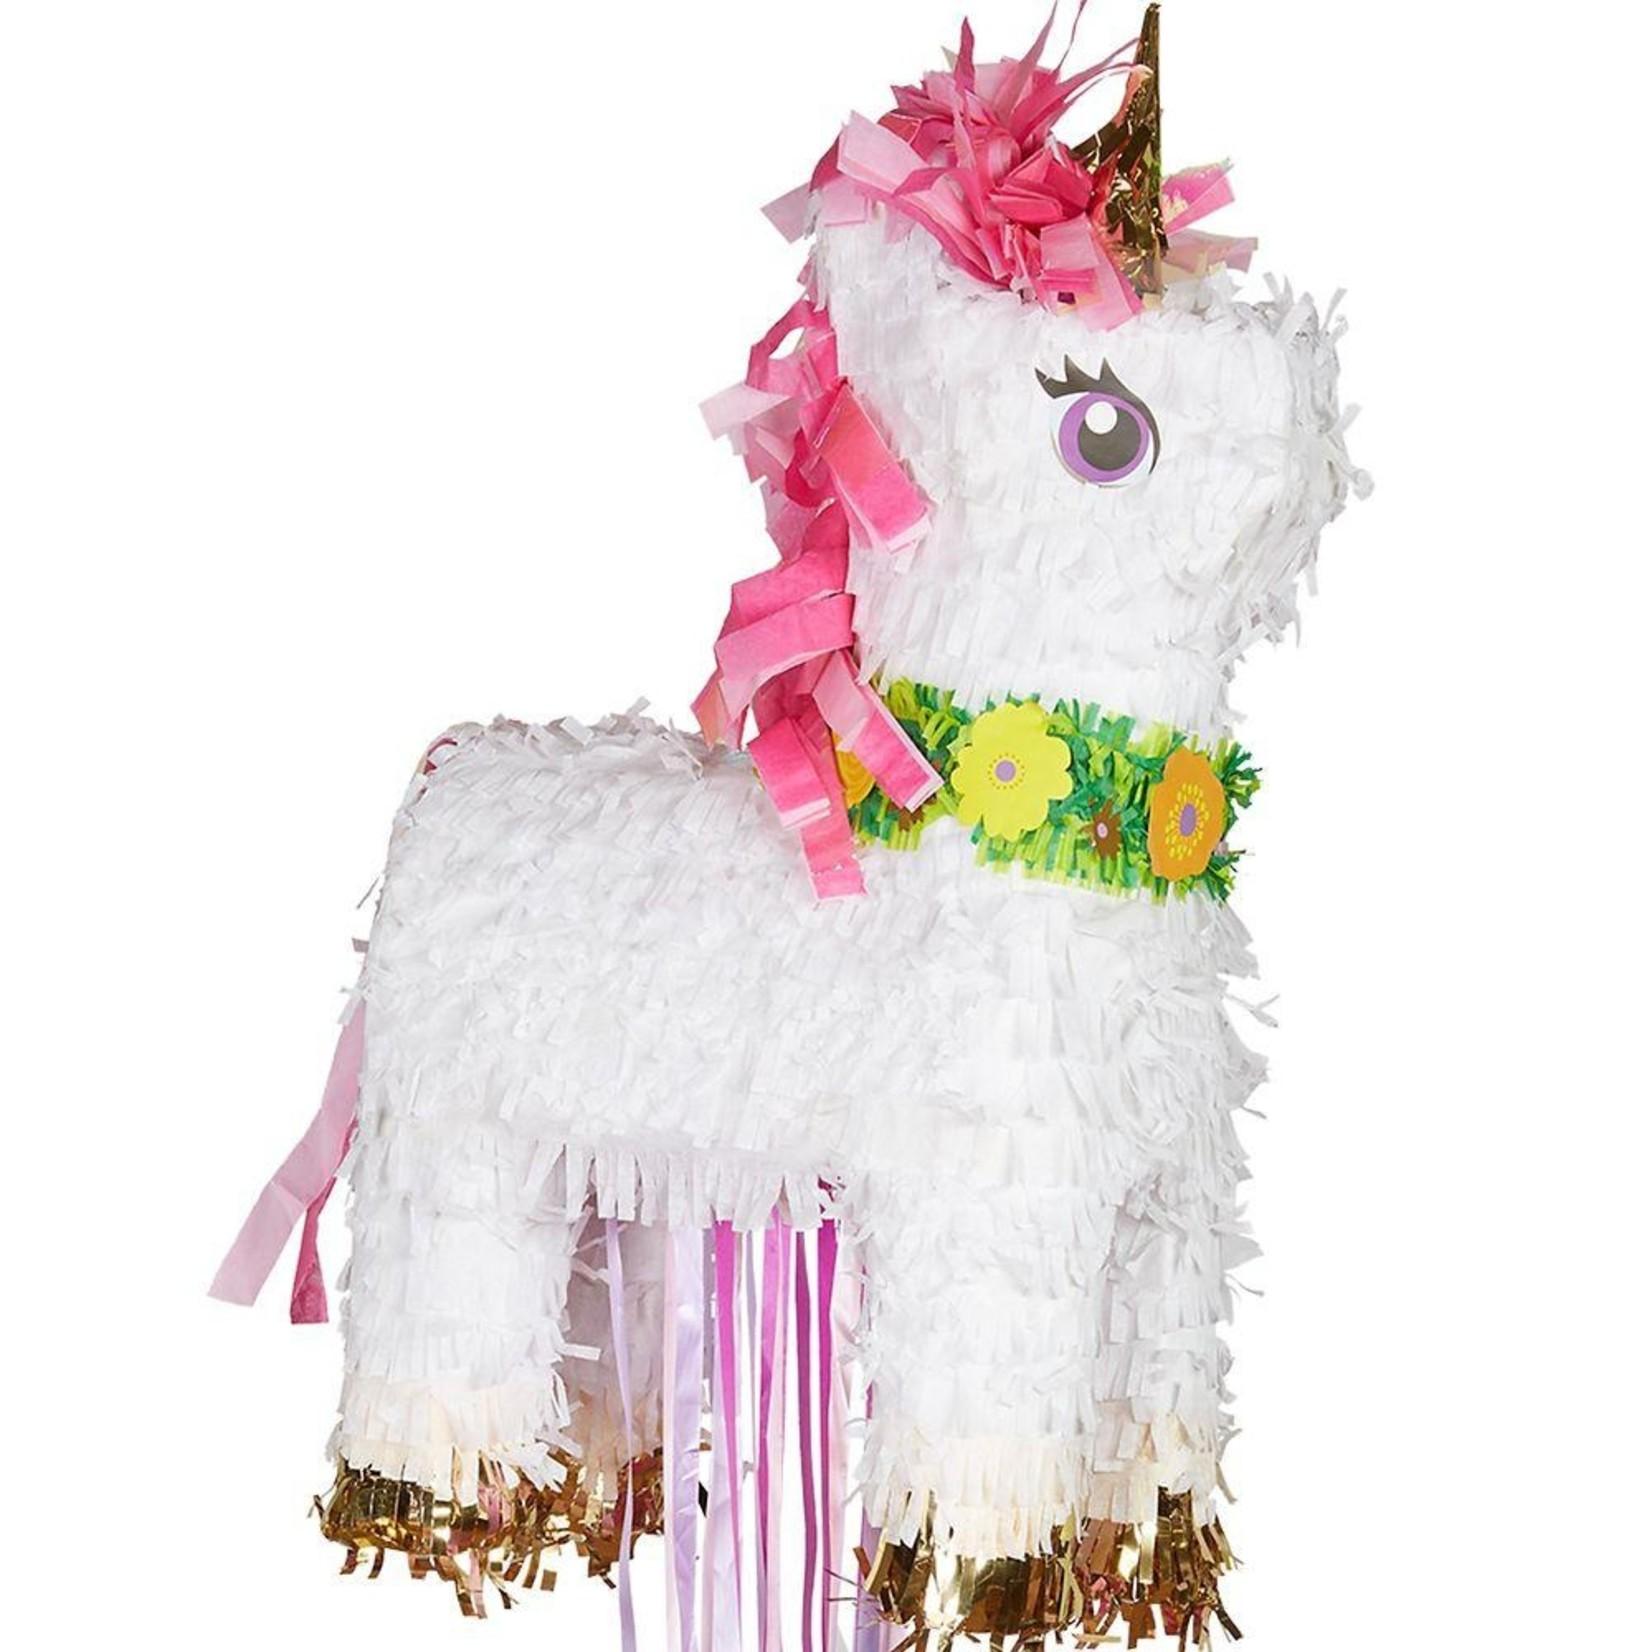 Pinata - Magical - Unicorn